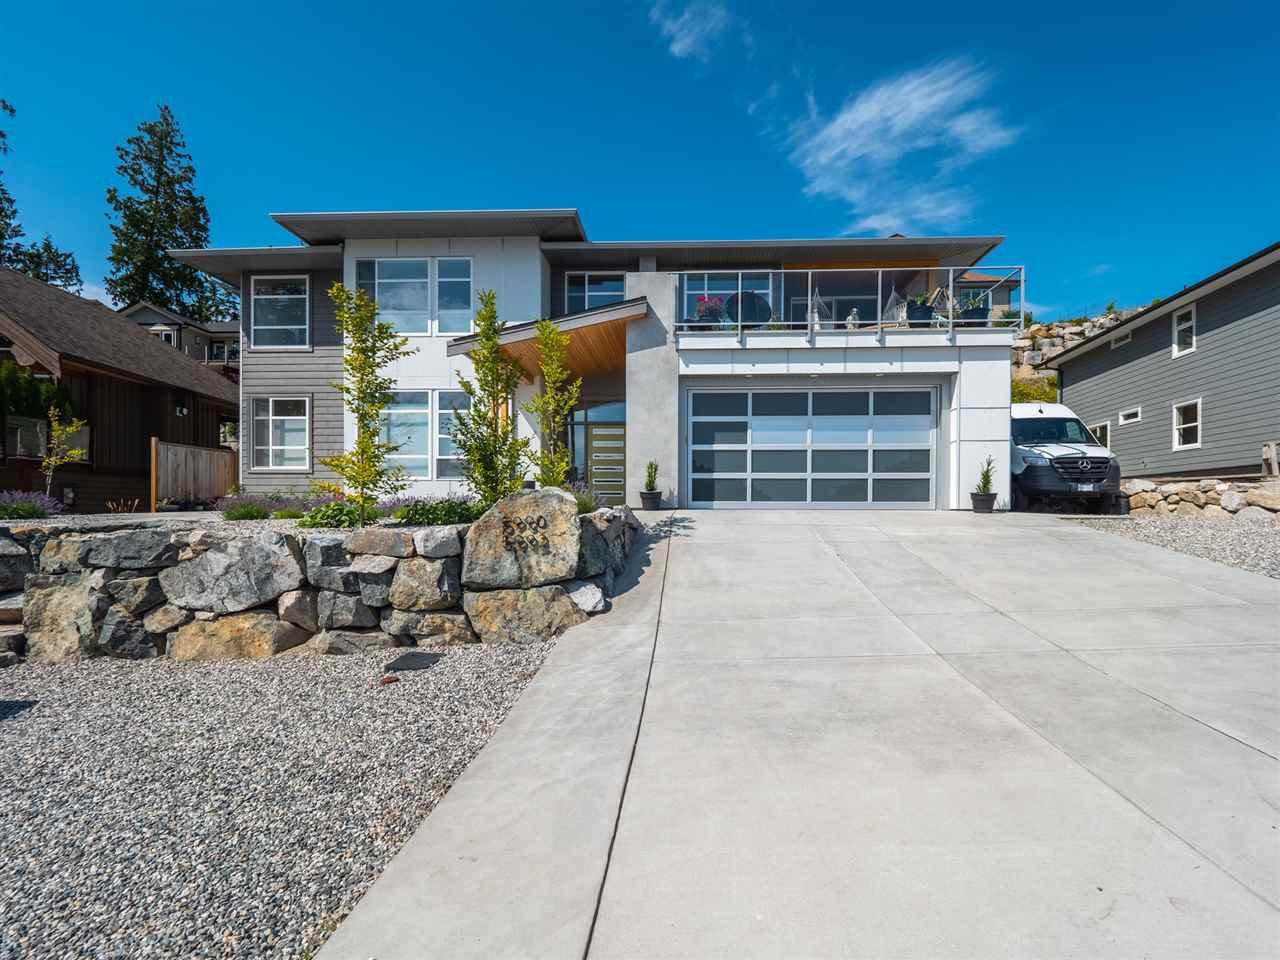 Main Photo: 5990 BARNACLE Street in Sechelt: Sechelt District House for sale (Sunshine Coast)  : MLS®# R2473923